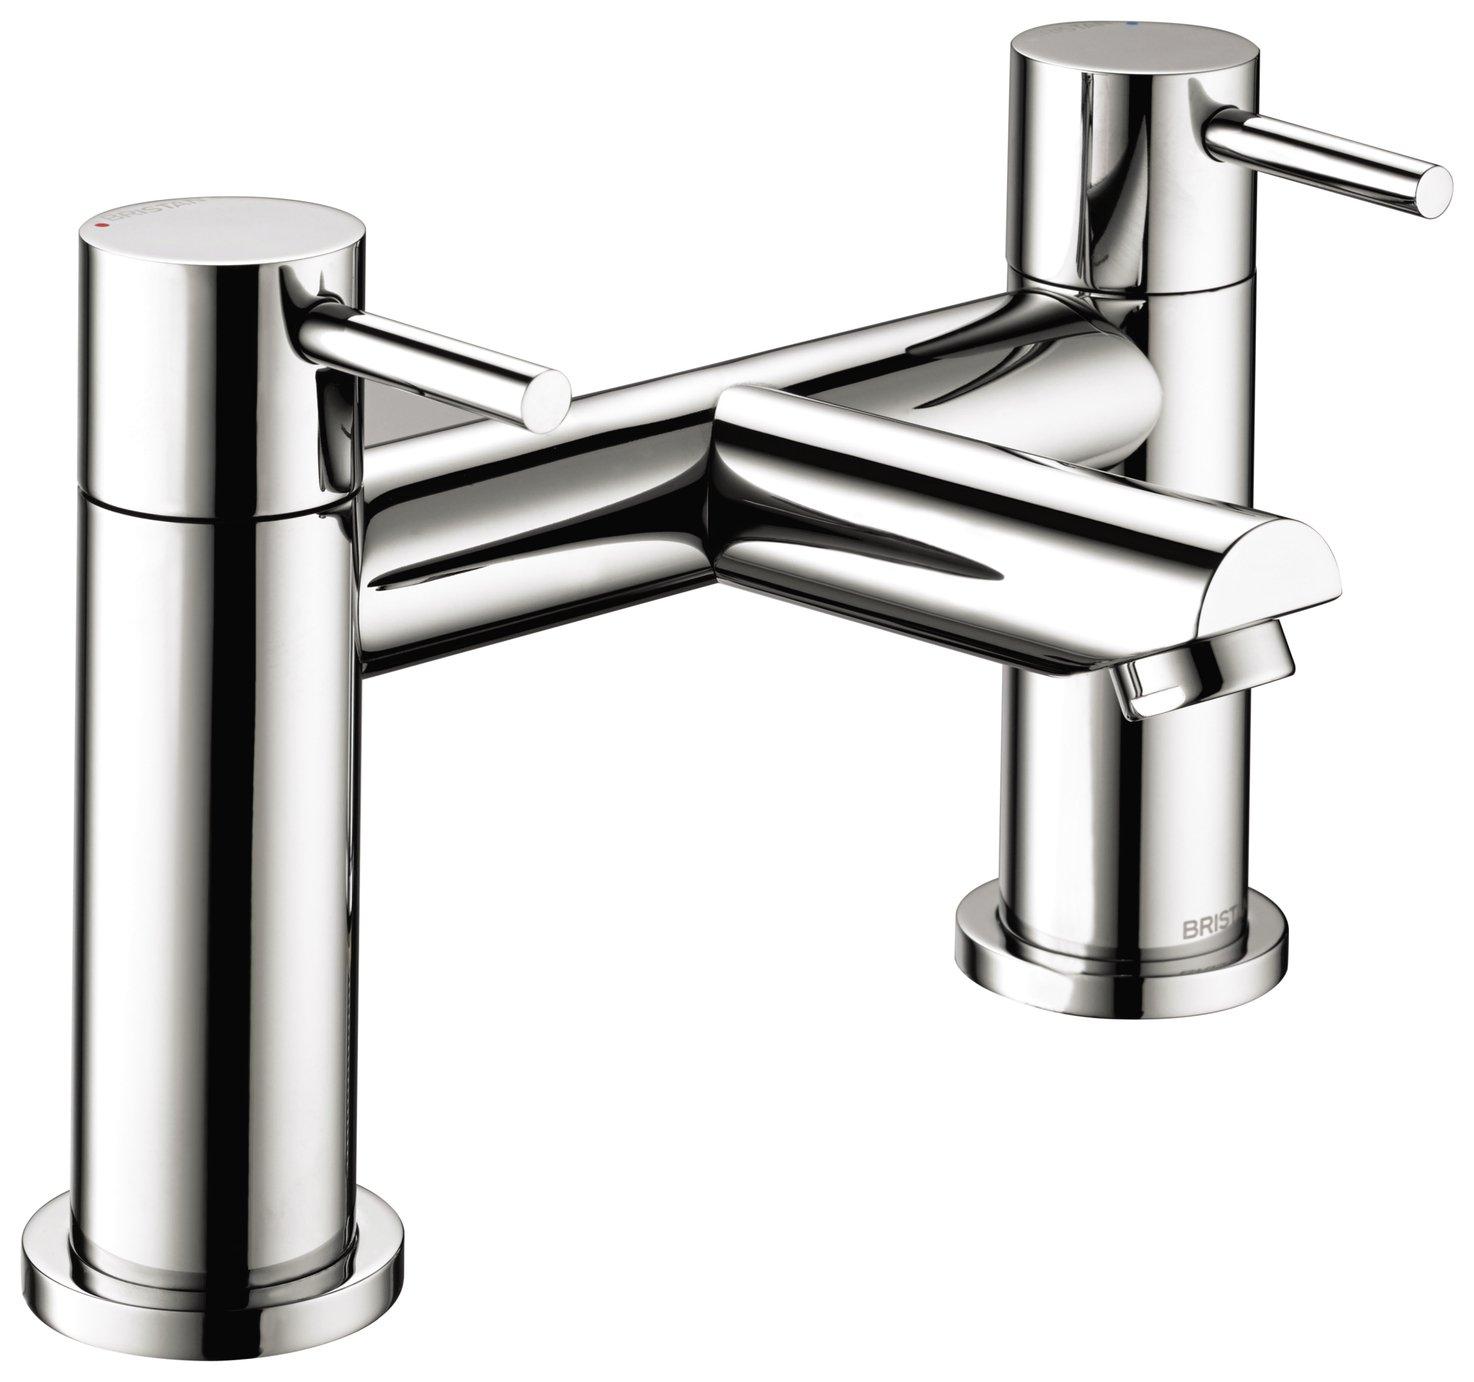 Bristan Blitz Bath Filler Tap